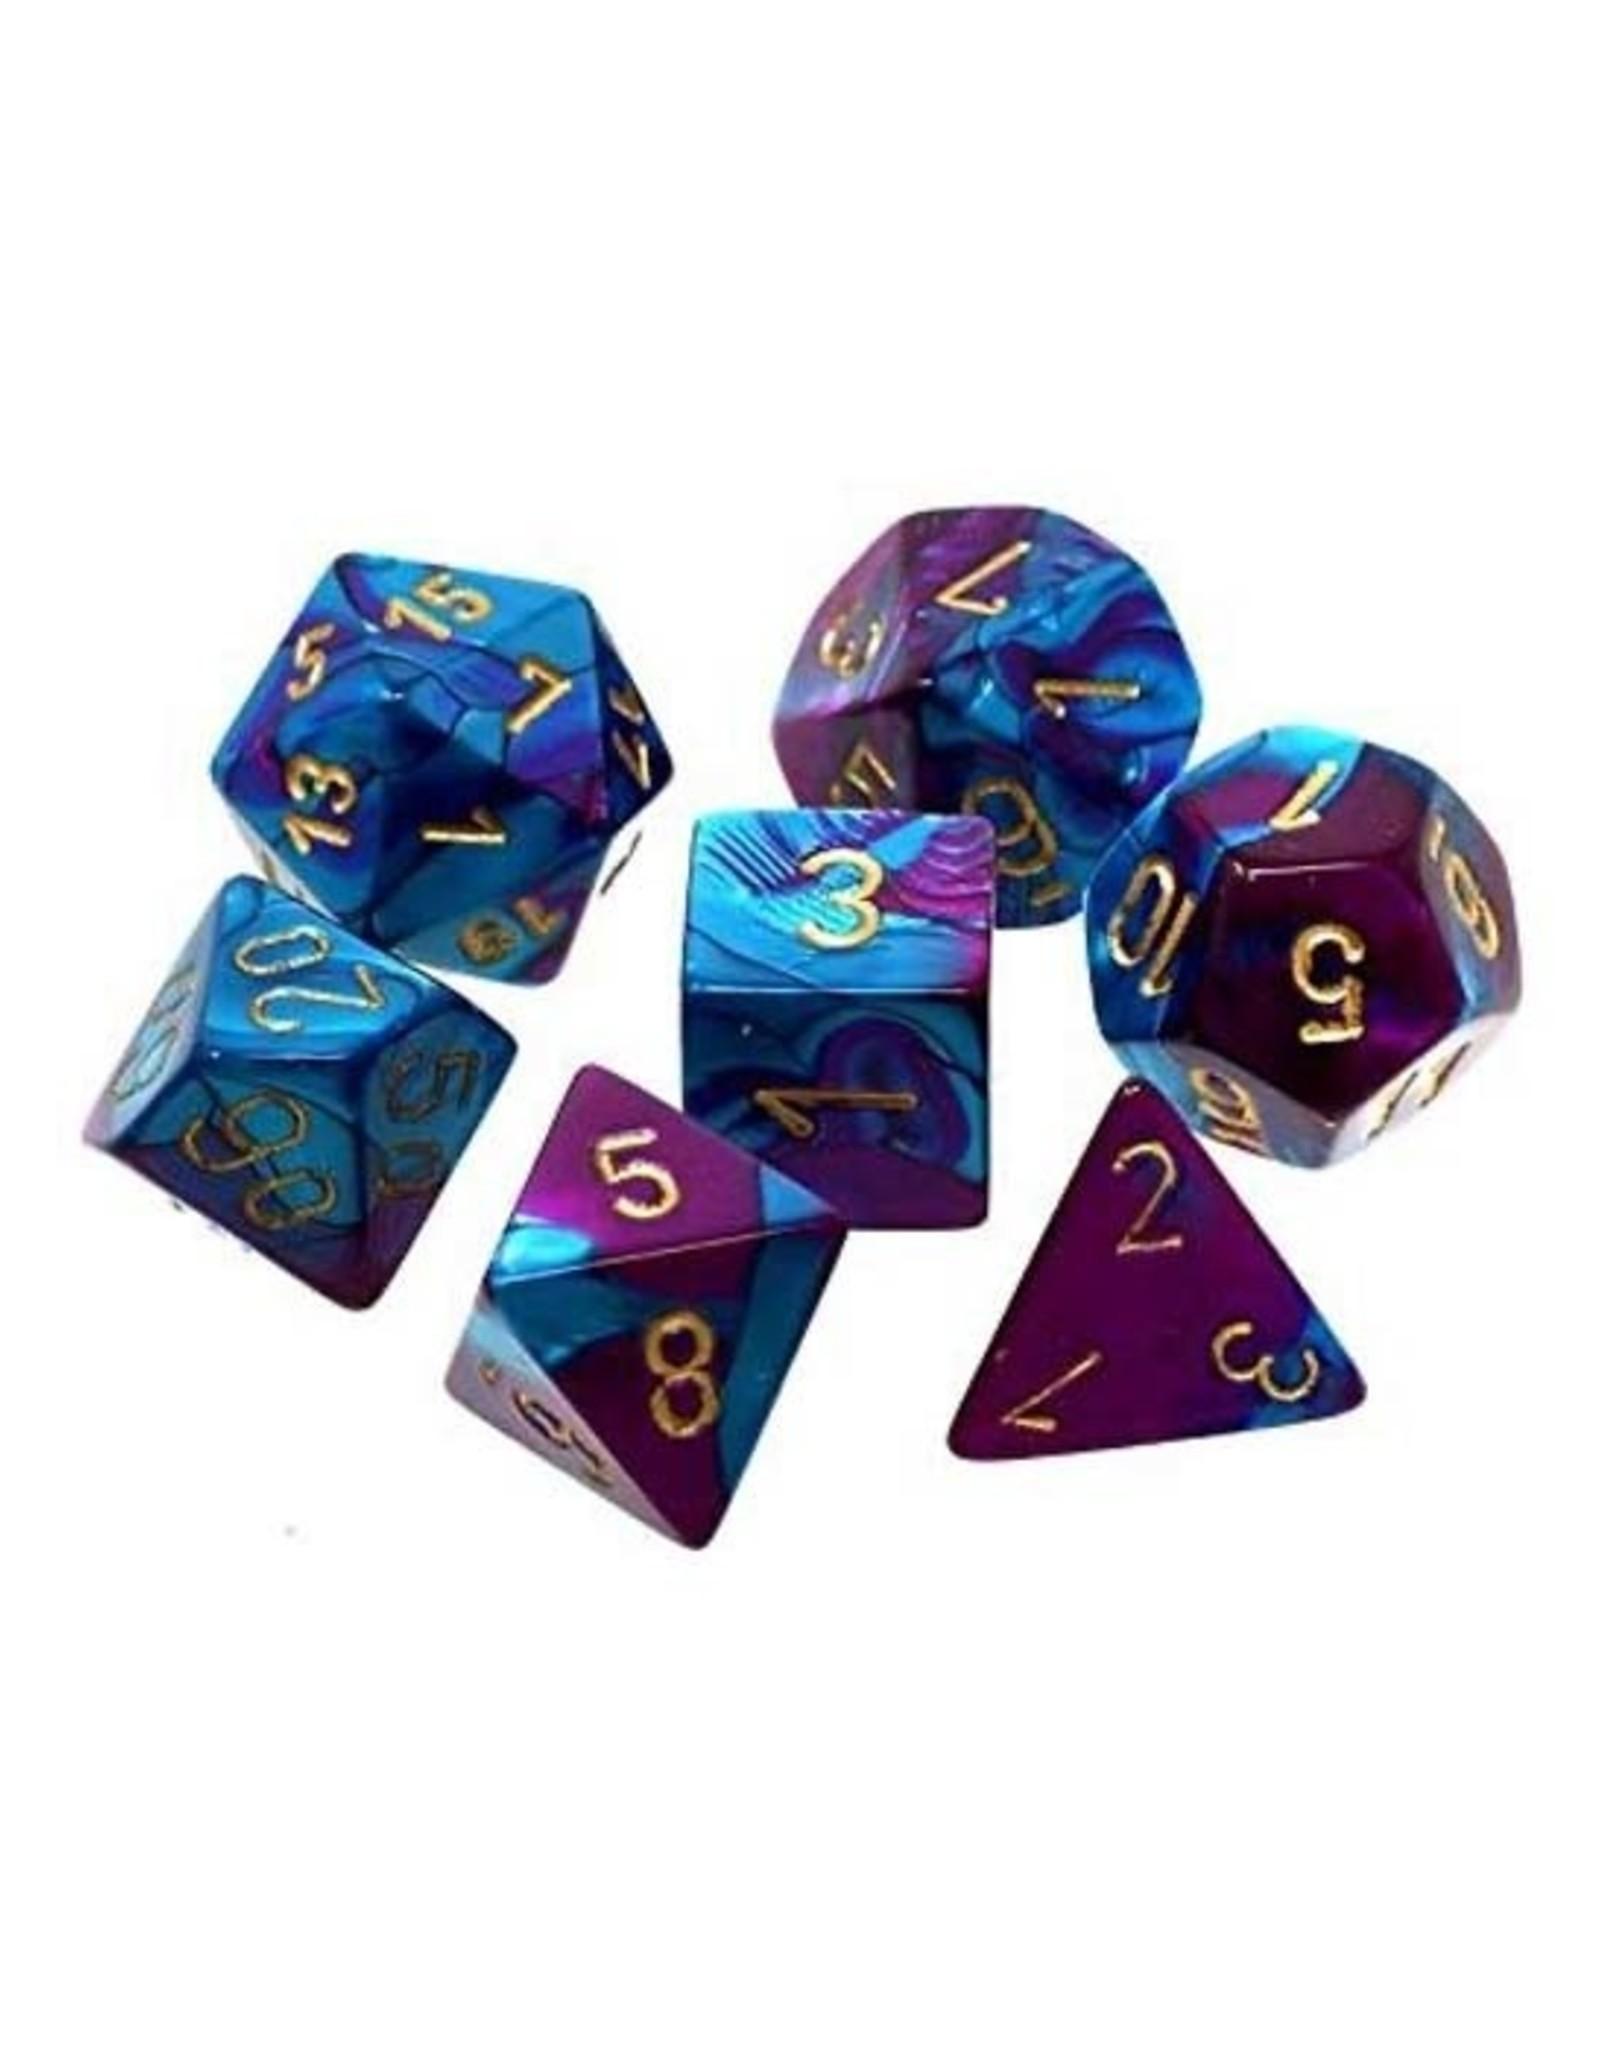 Chessex Chessex: Poly 7 Set - Gemini - Purple-Teal w/ Gold